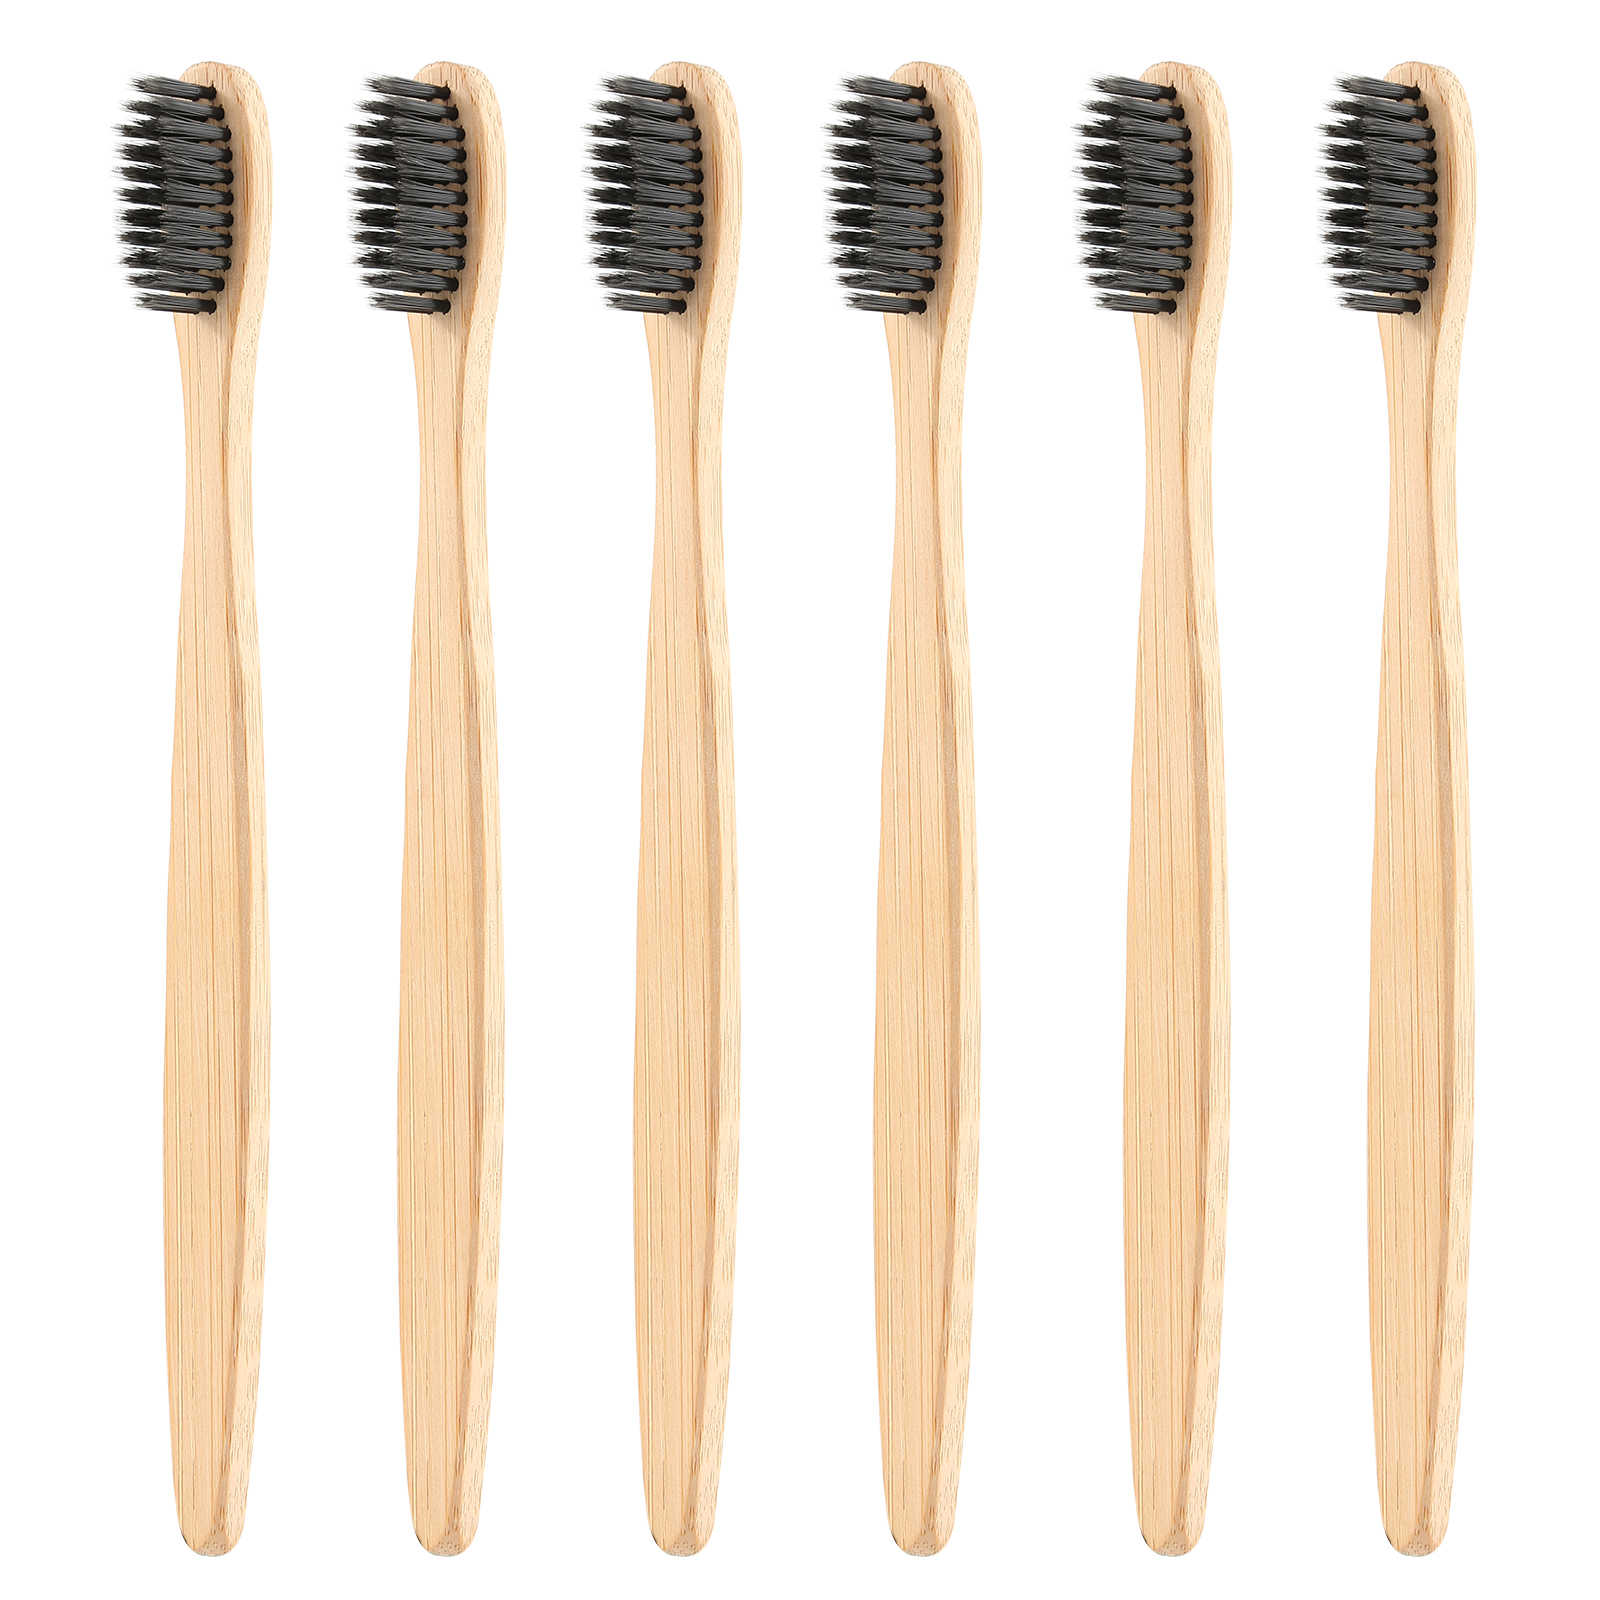 2/1 Pcs Lingkungan Bambu Arang Kesehatan Sikat Gigi untuk Perawatan Mulut Gigi Membersihkan Eco Sedang Lembut Bulu Sikat